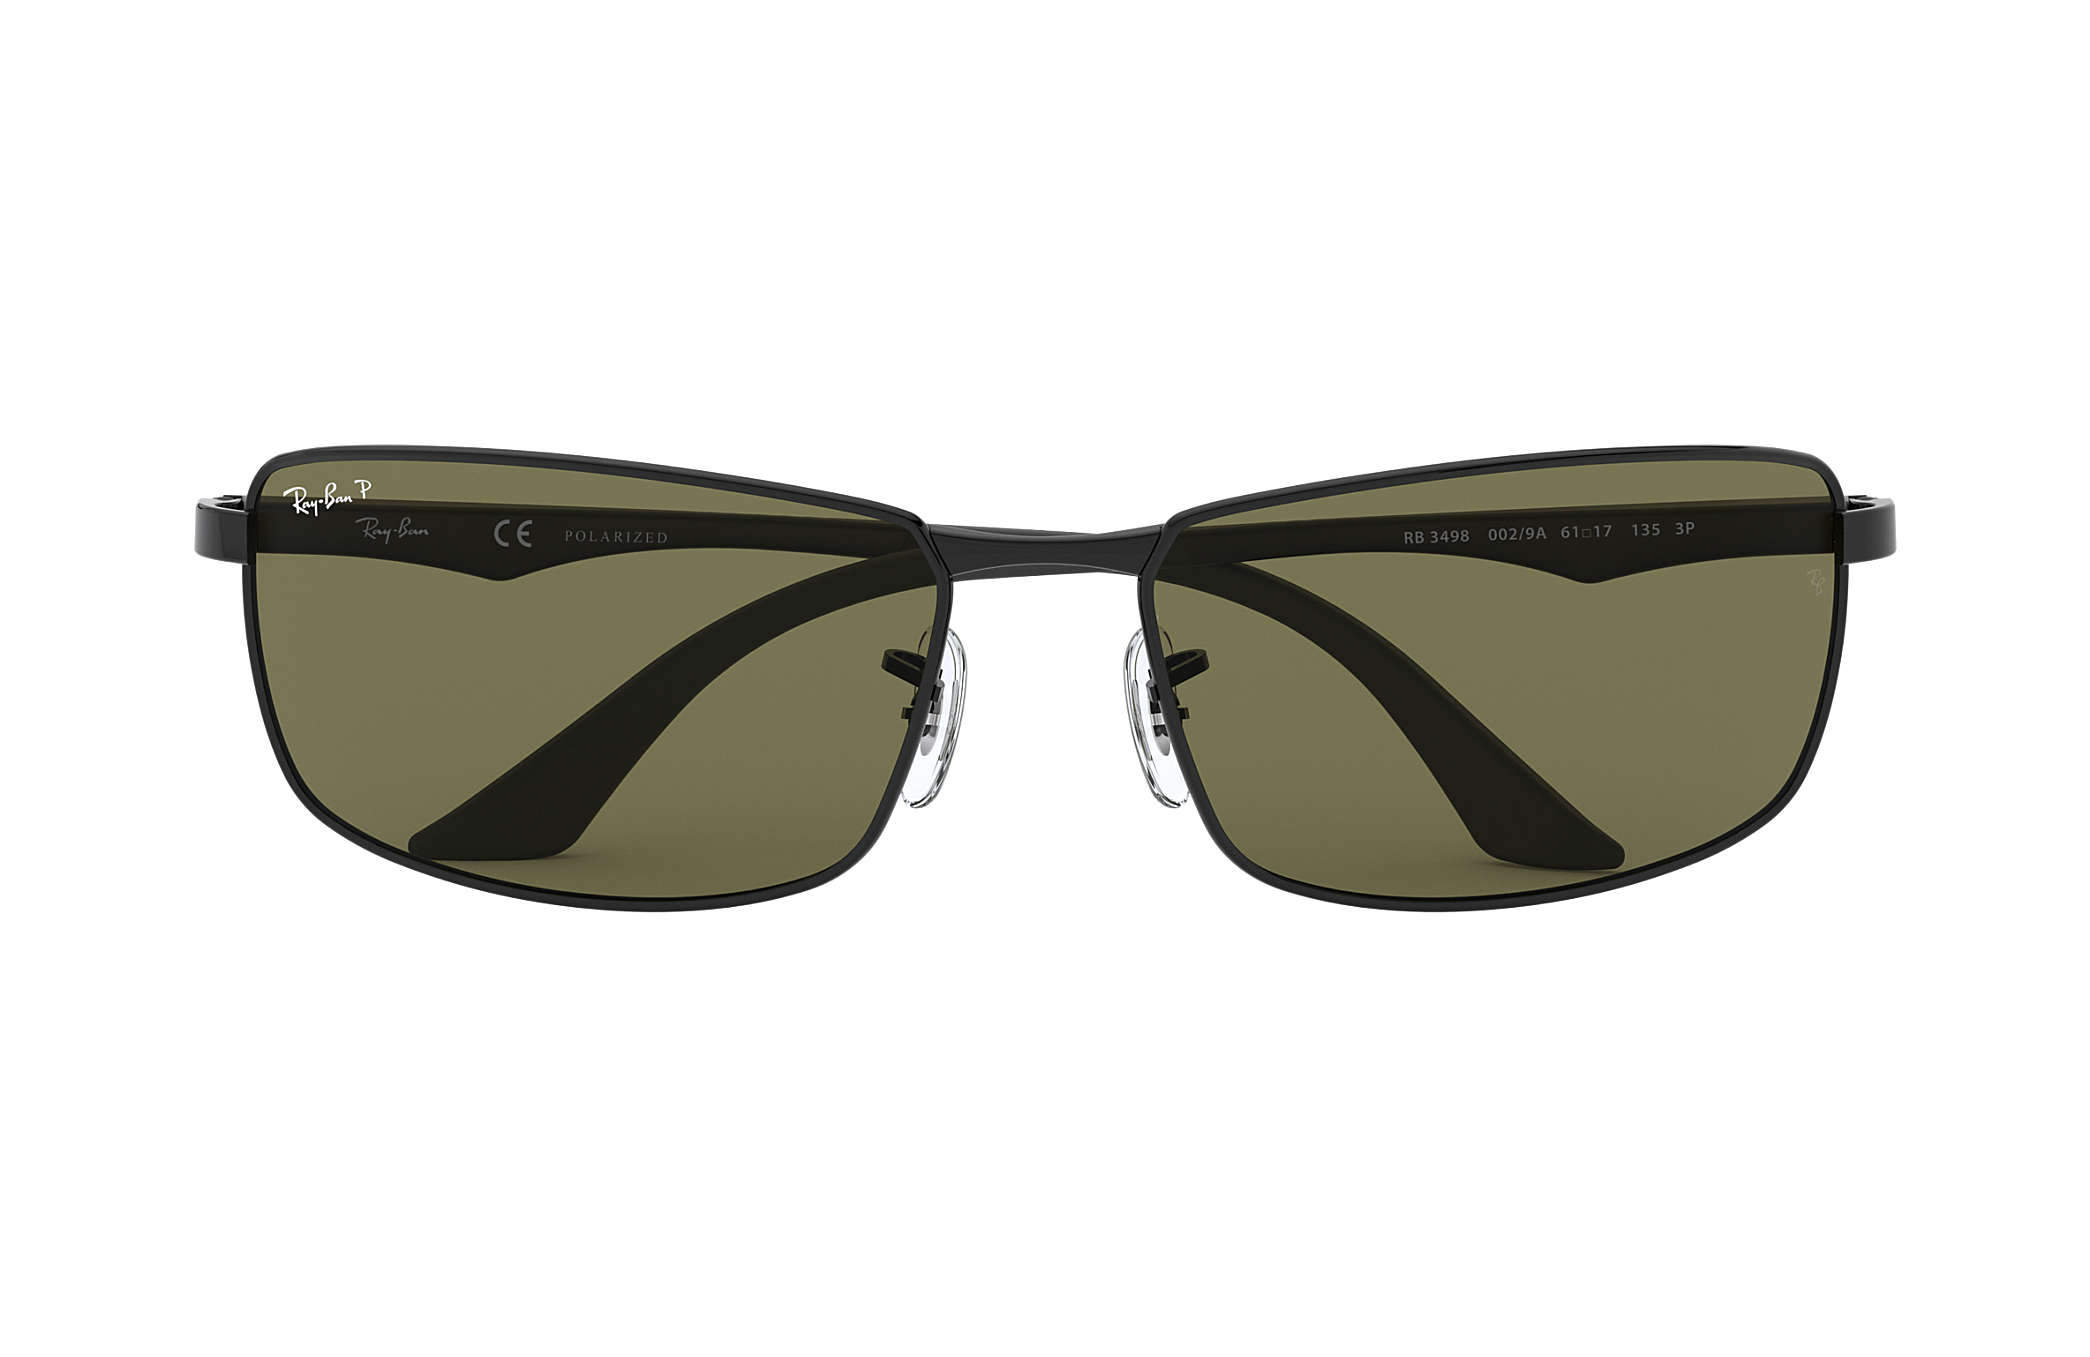 9b6dd731d04d6 Ray-Ban RB3498 Black - Metal - Green Polarized Lenses - 0RB3498002 ...